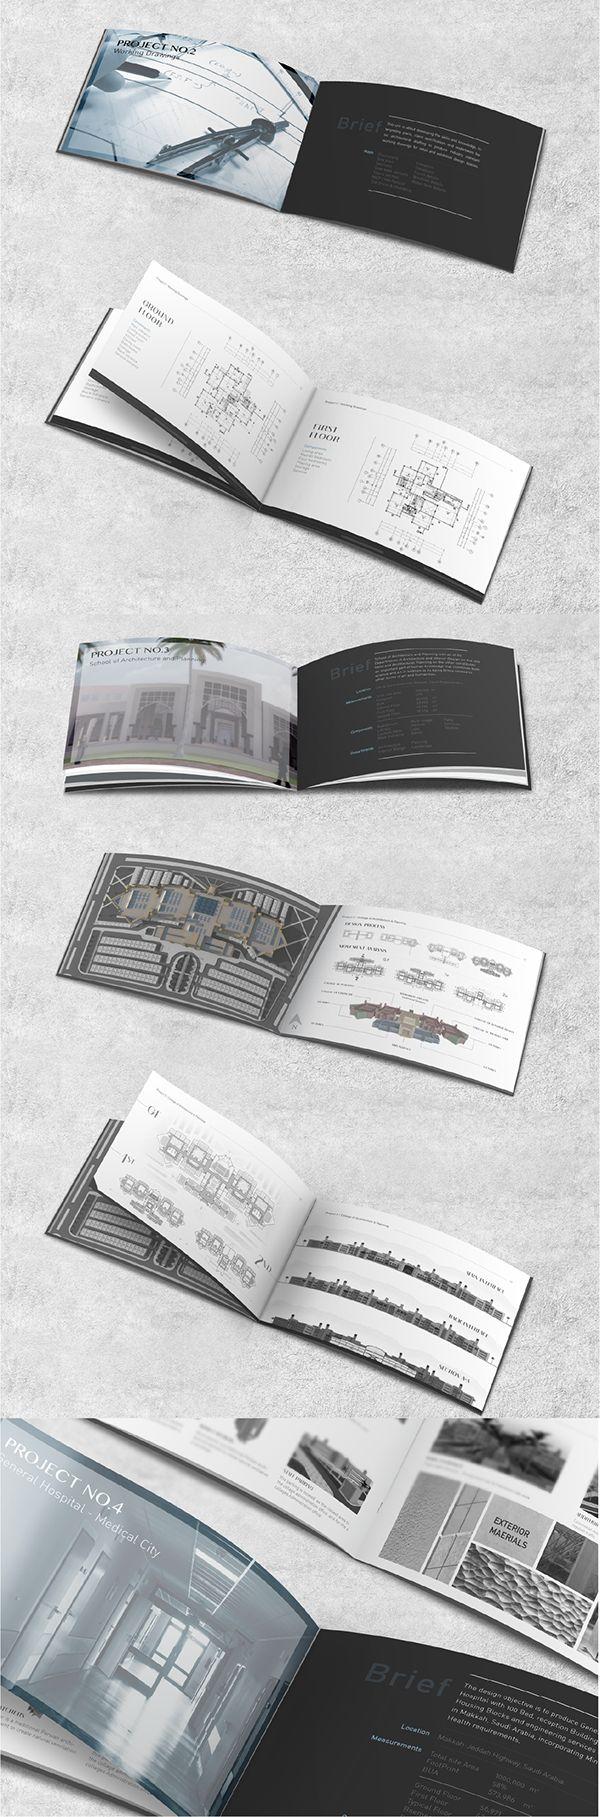 Architecture Portfolio on Behance